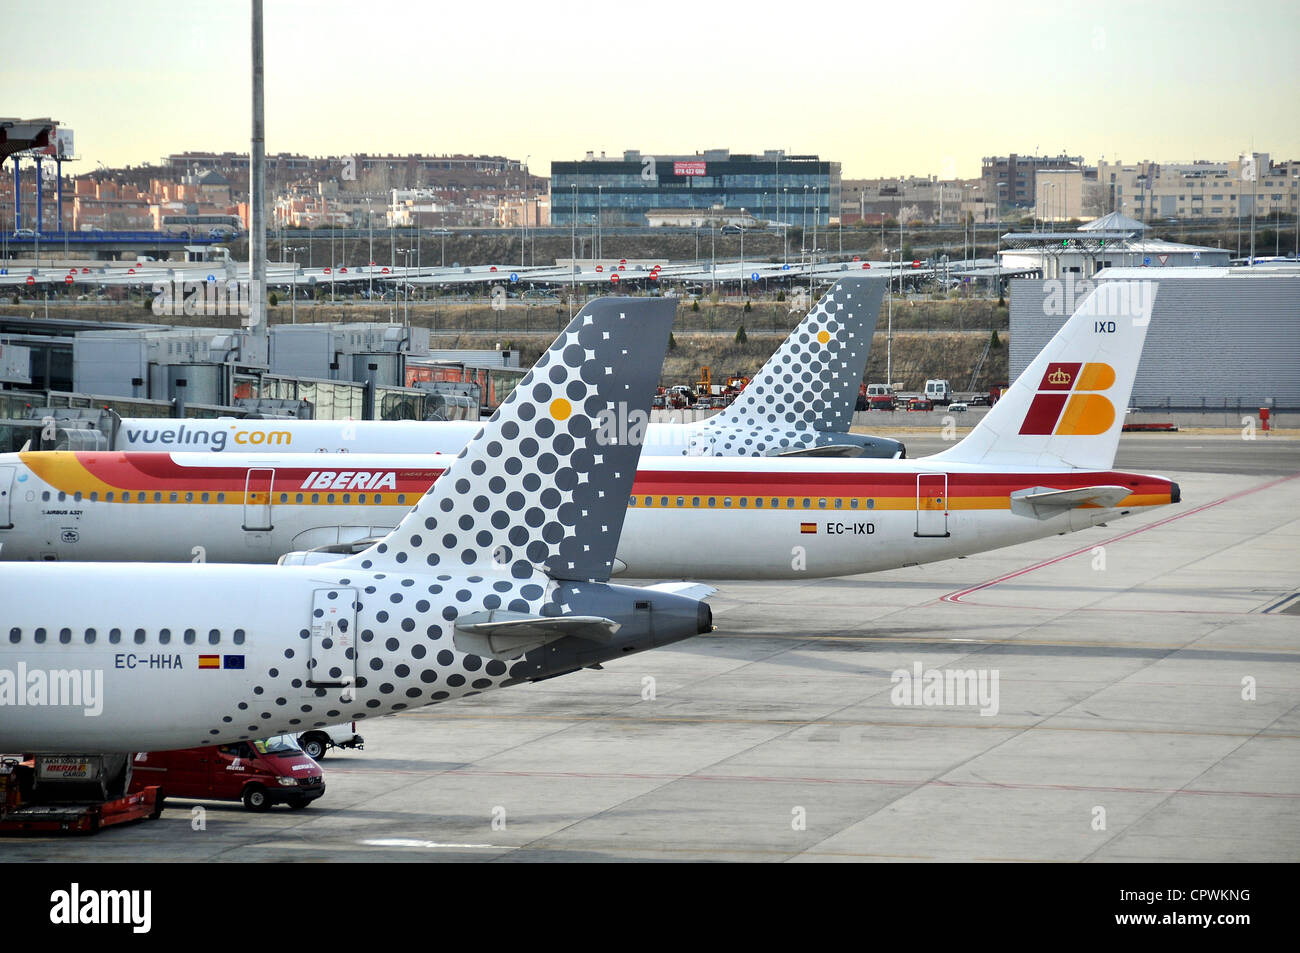 Iberia and Vueling.com planes Barajas international airport Madrid Spain - Stock Image